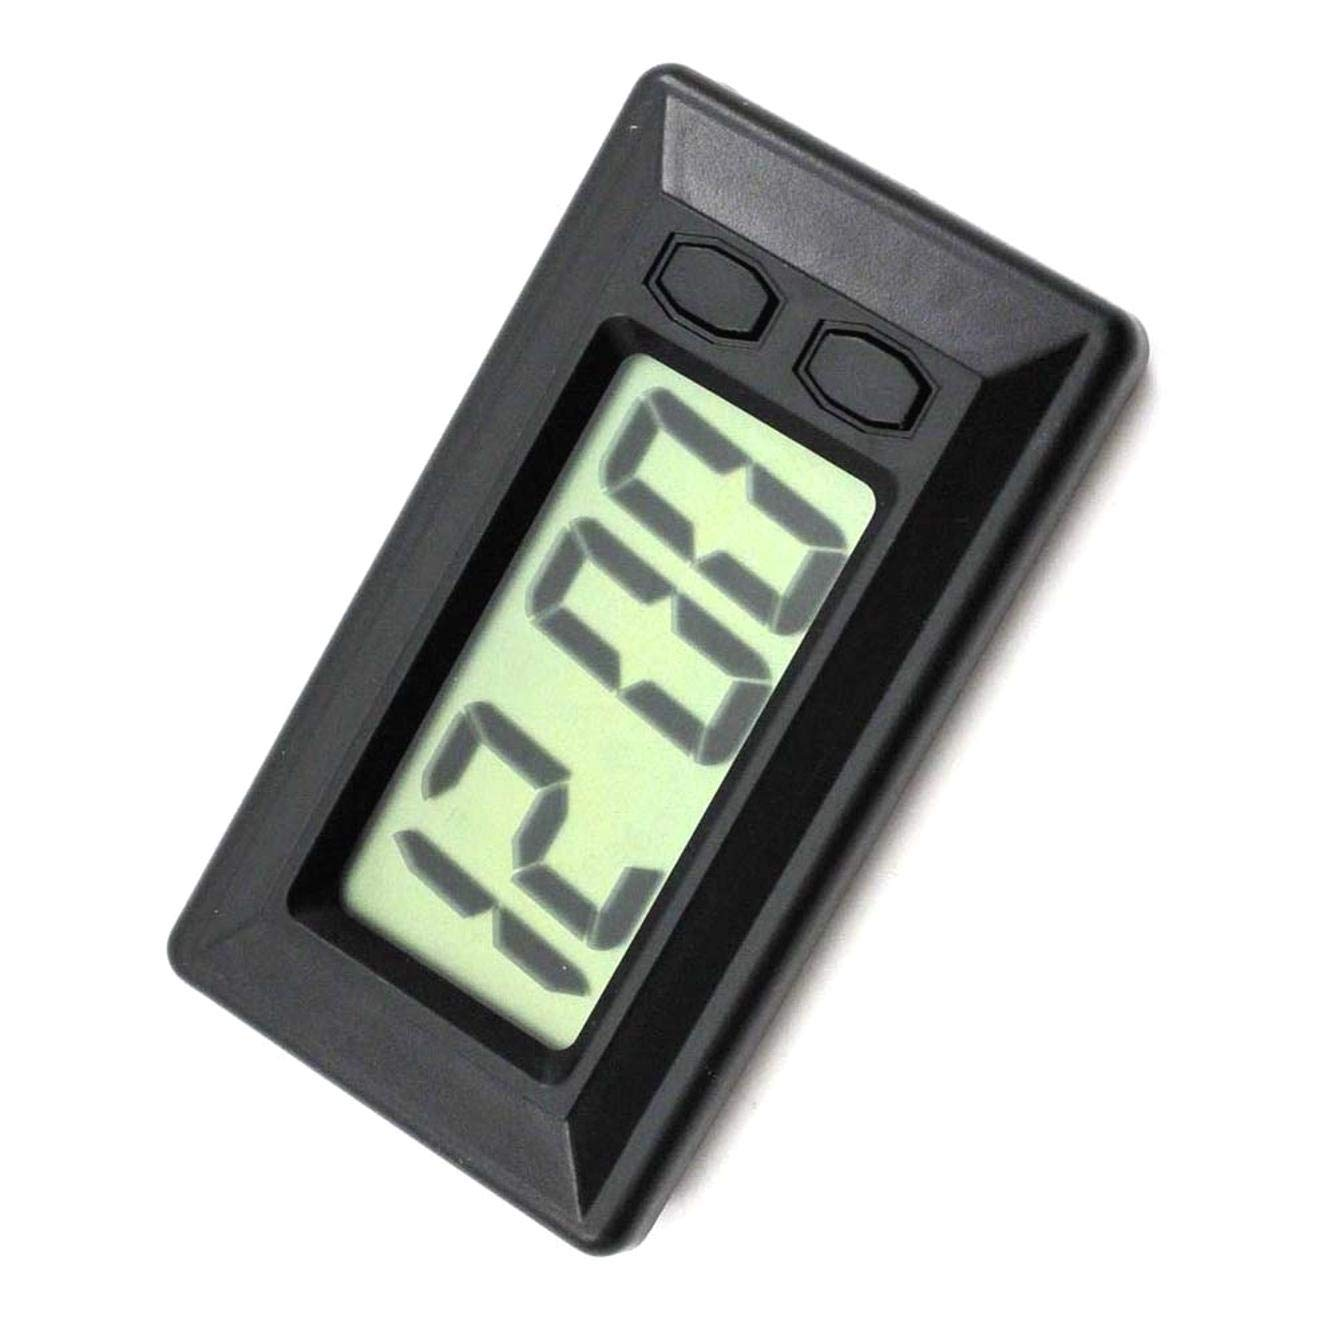 SALAKA 1PC Schwarz LCD Digital Display Auto Armaturenbrett Uhr mit Kalender